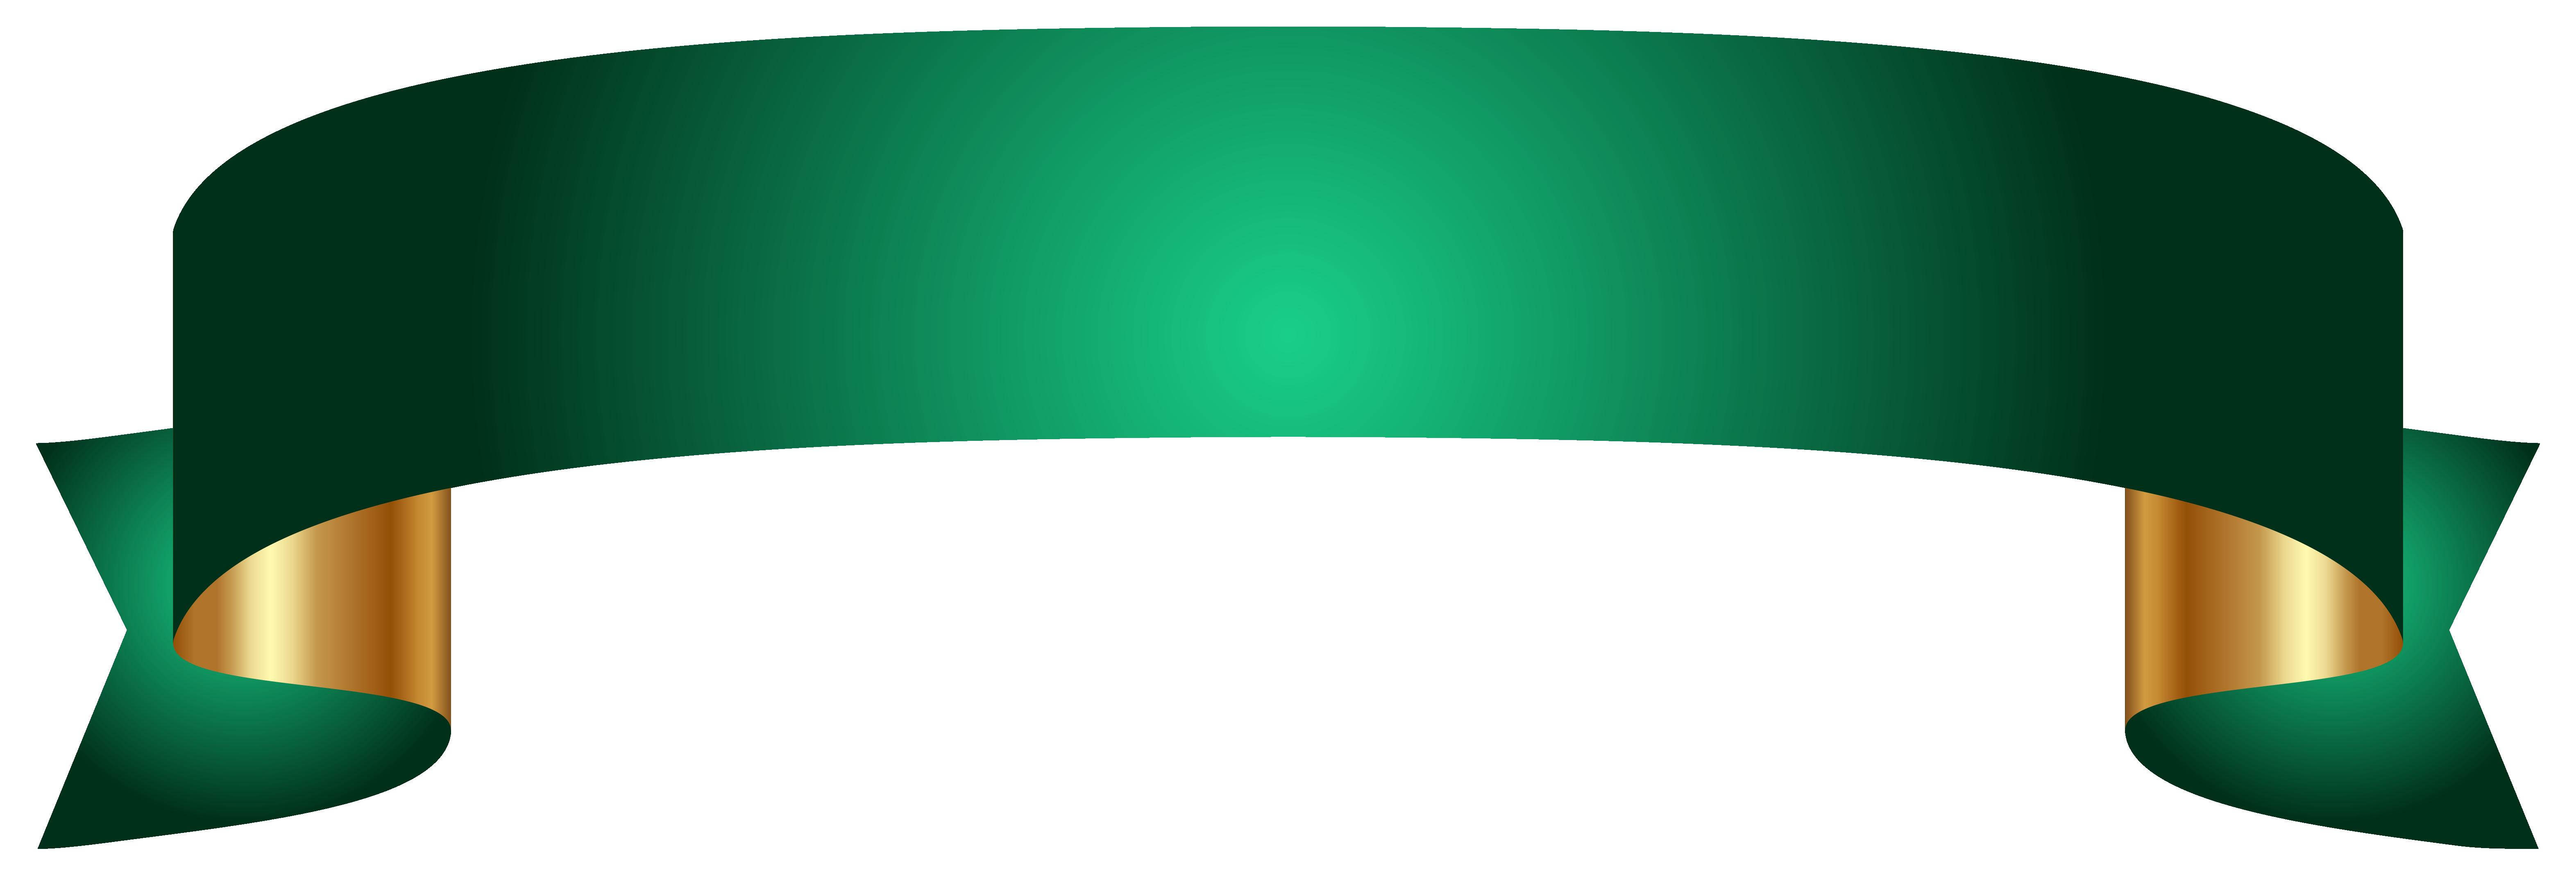 Green Banner Transparent PNG Clip Art Image.